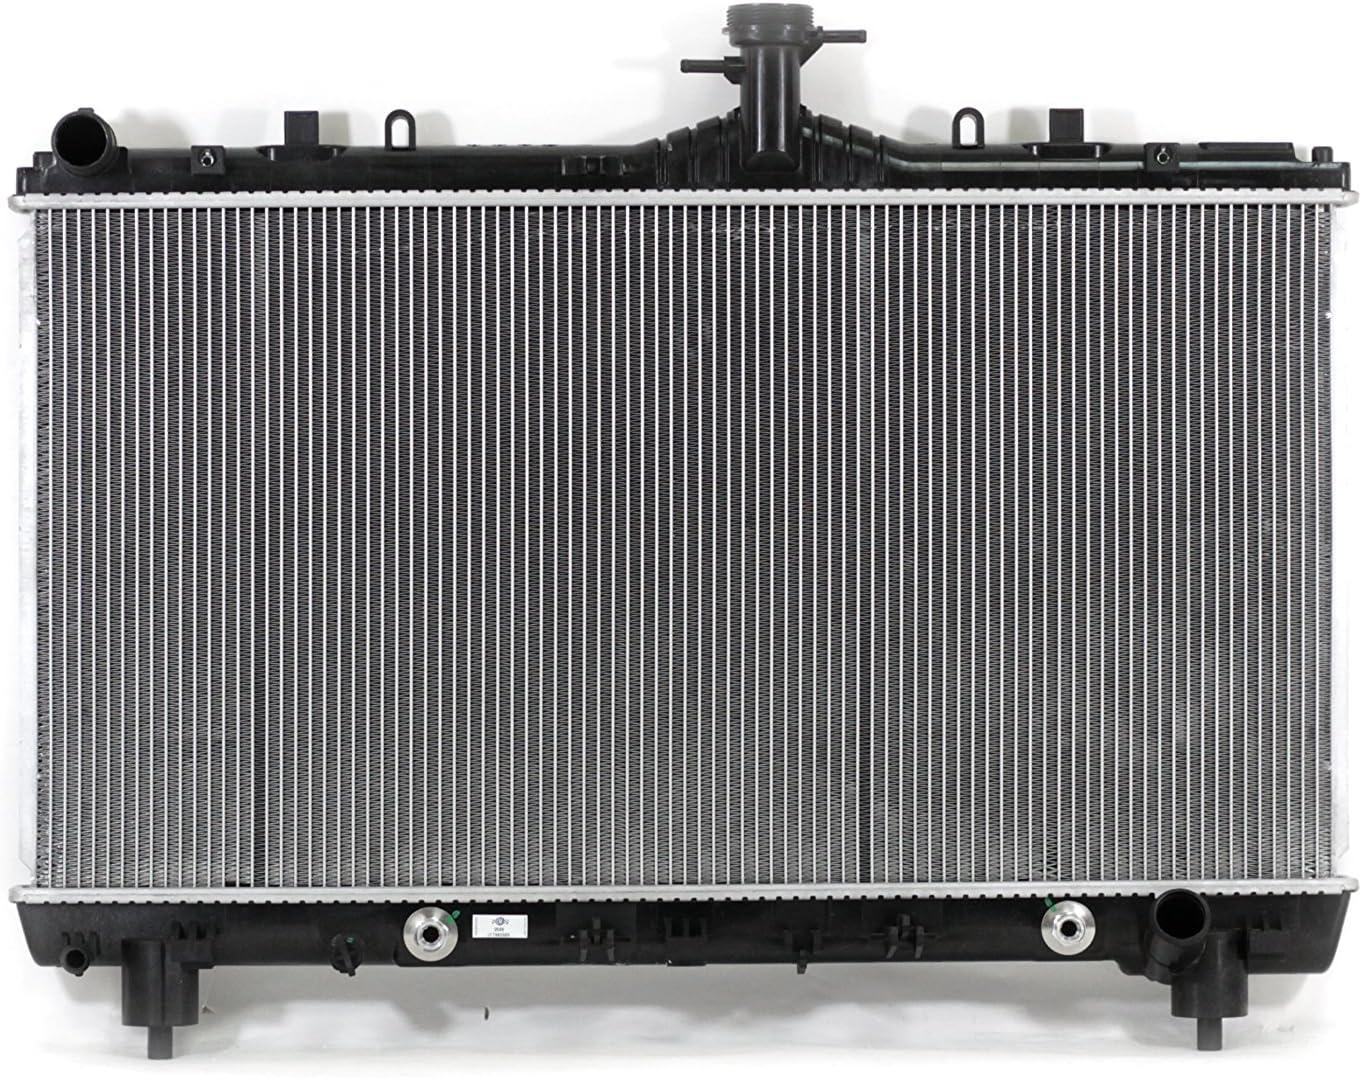 Radiator For 12-15 Chevrolet Fits Camaro 6.2l V8 Free Shipping